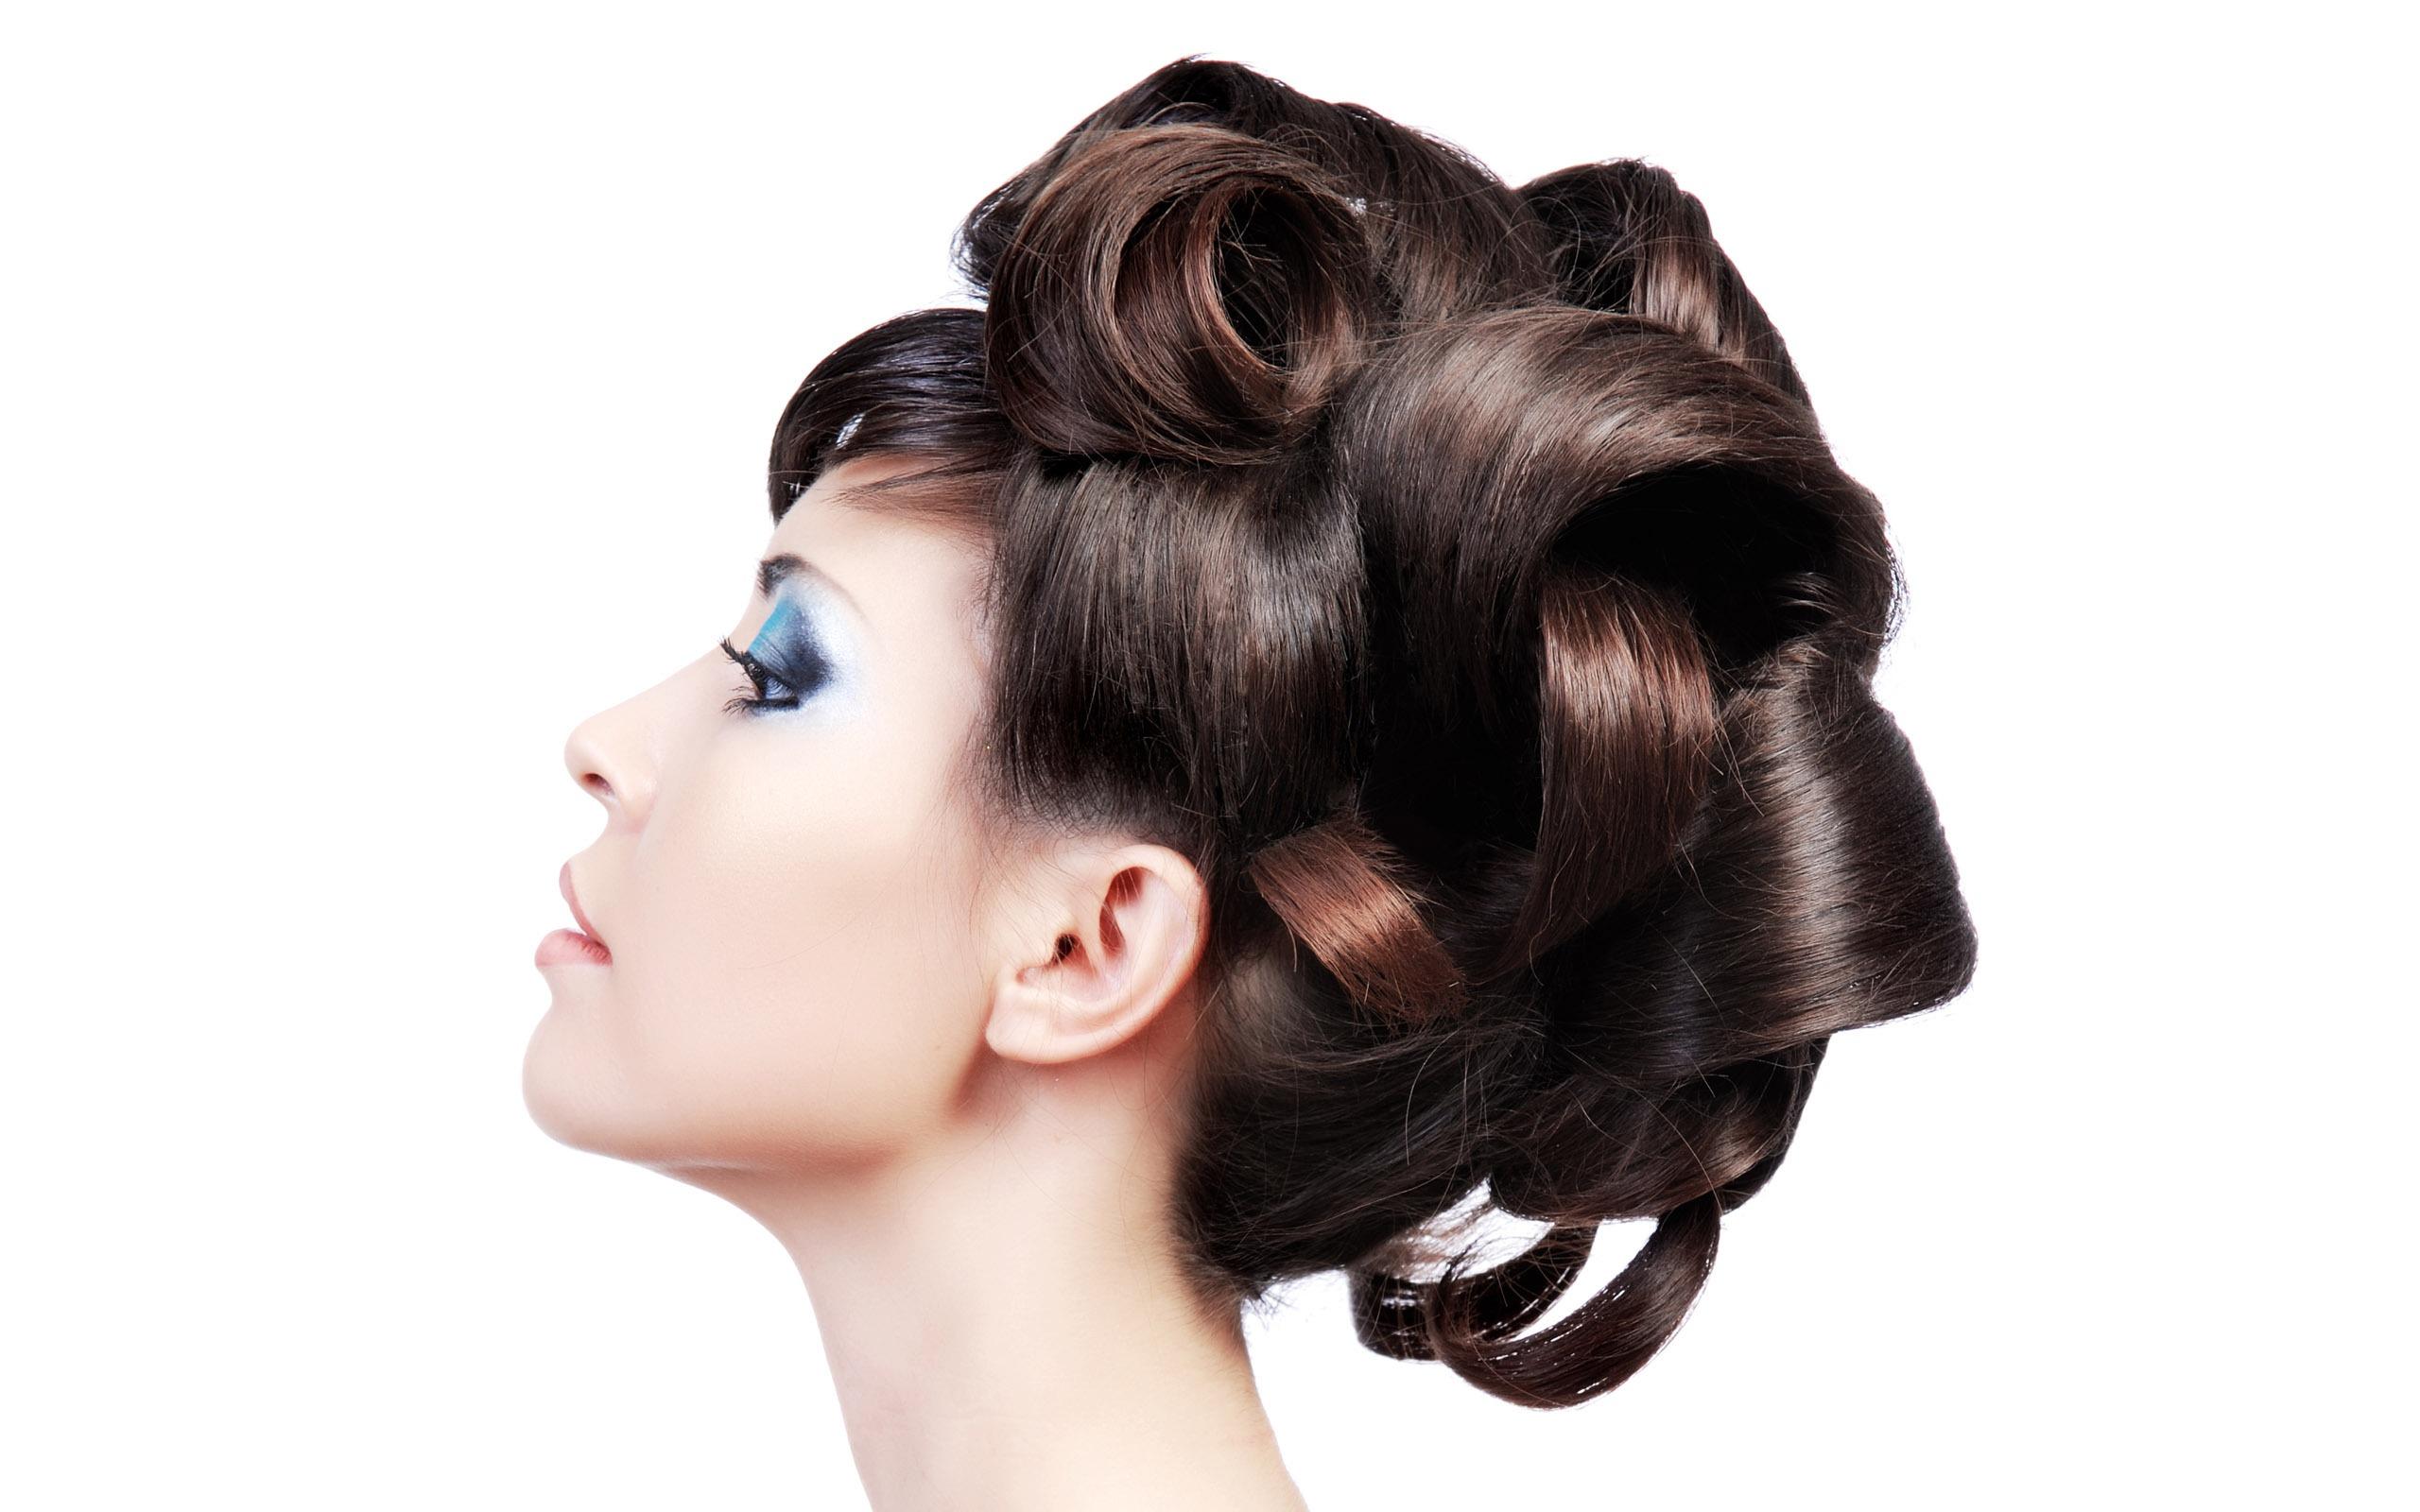 Beauty Salon Hair Style Print Art Spa Shop Decor BP123 - A3 Poster Art.